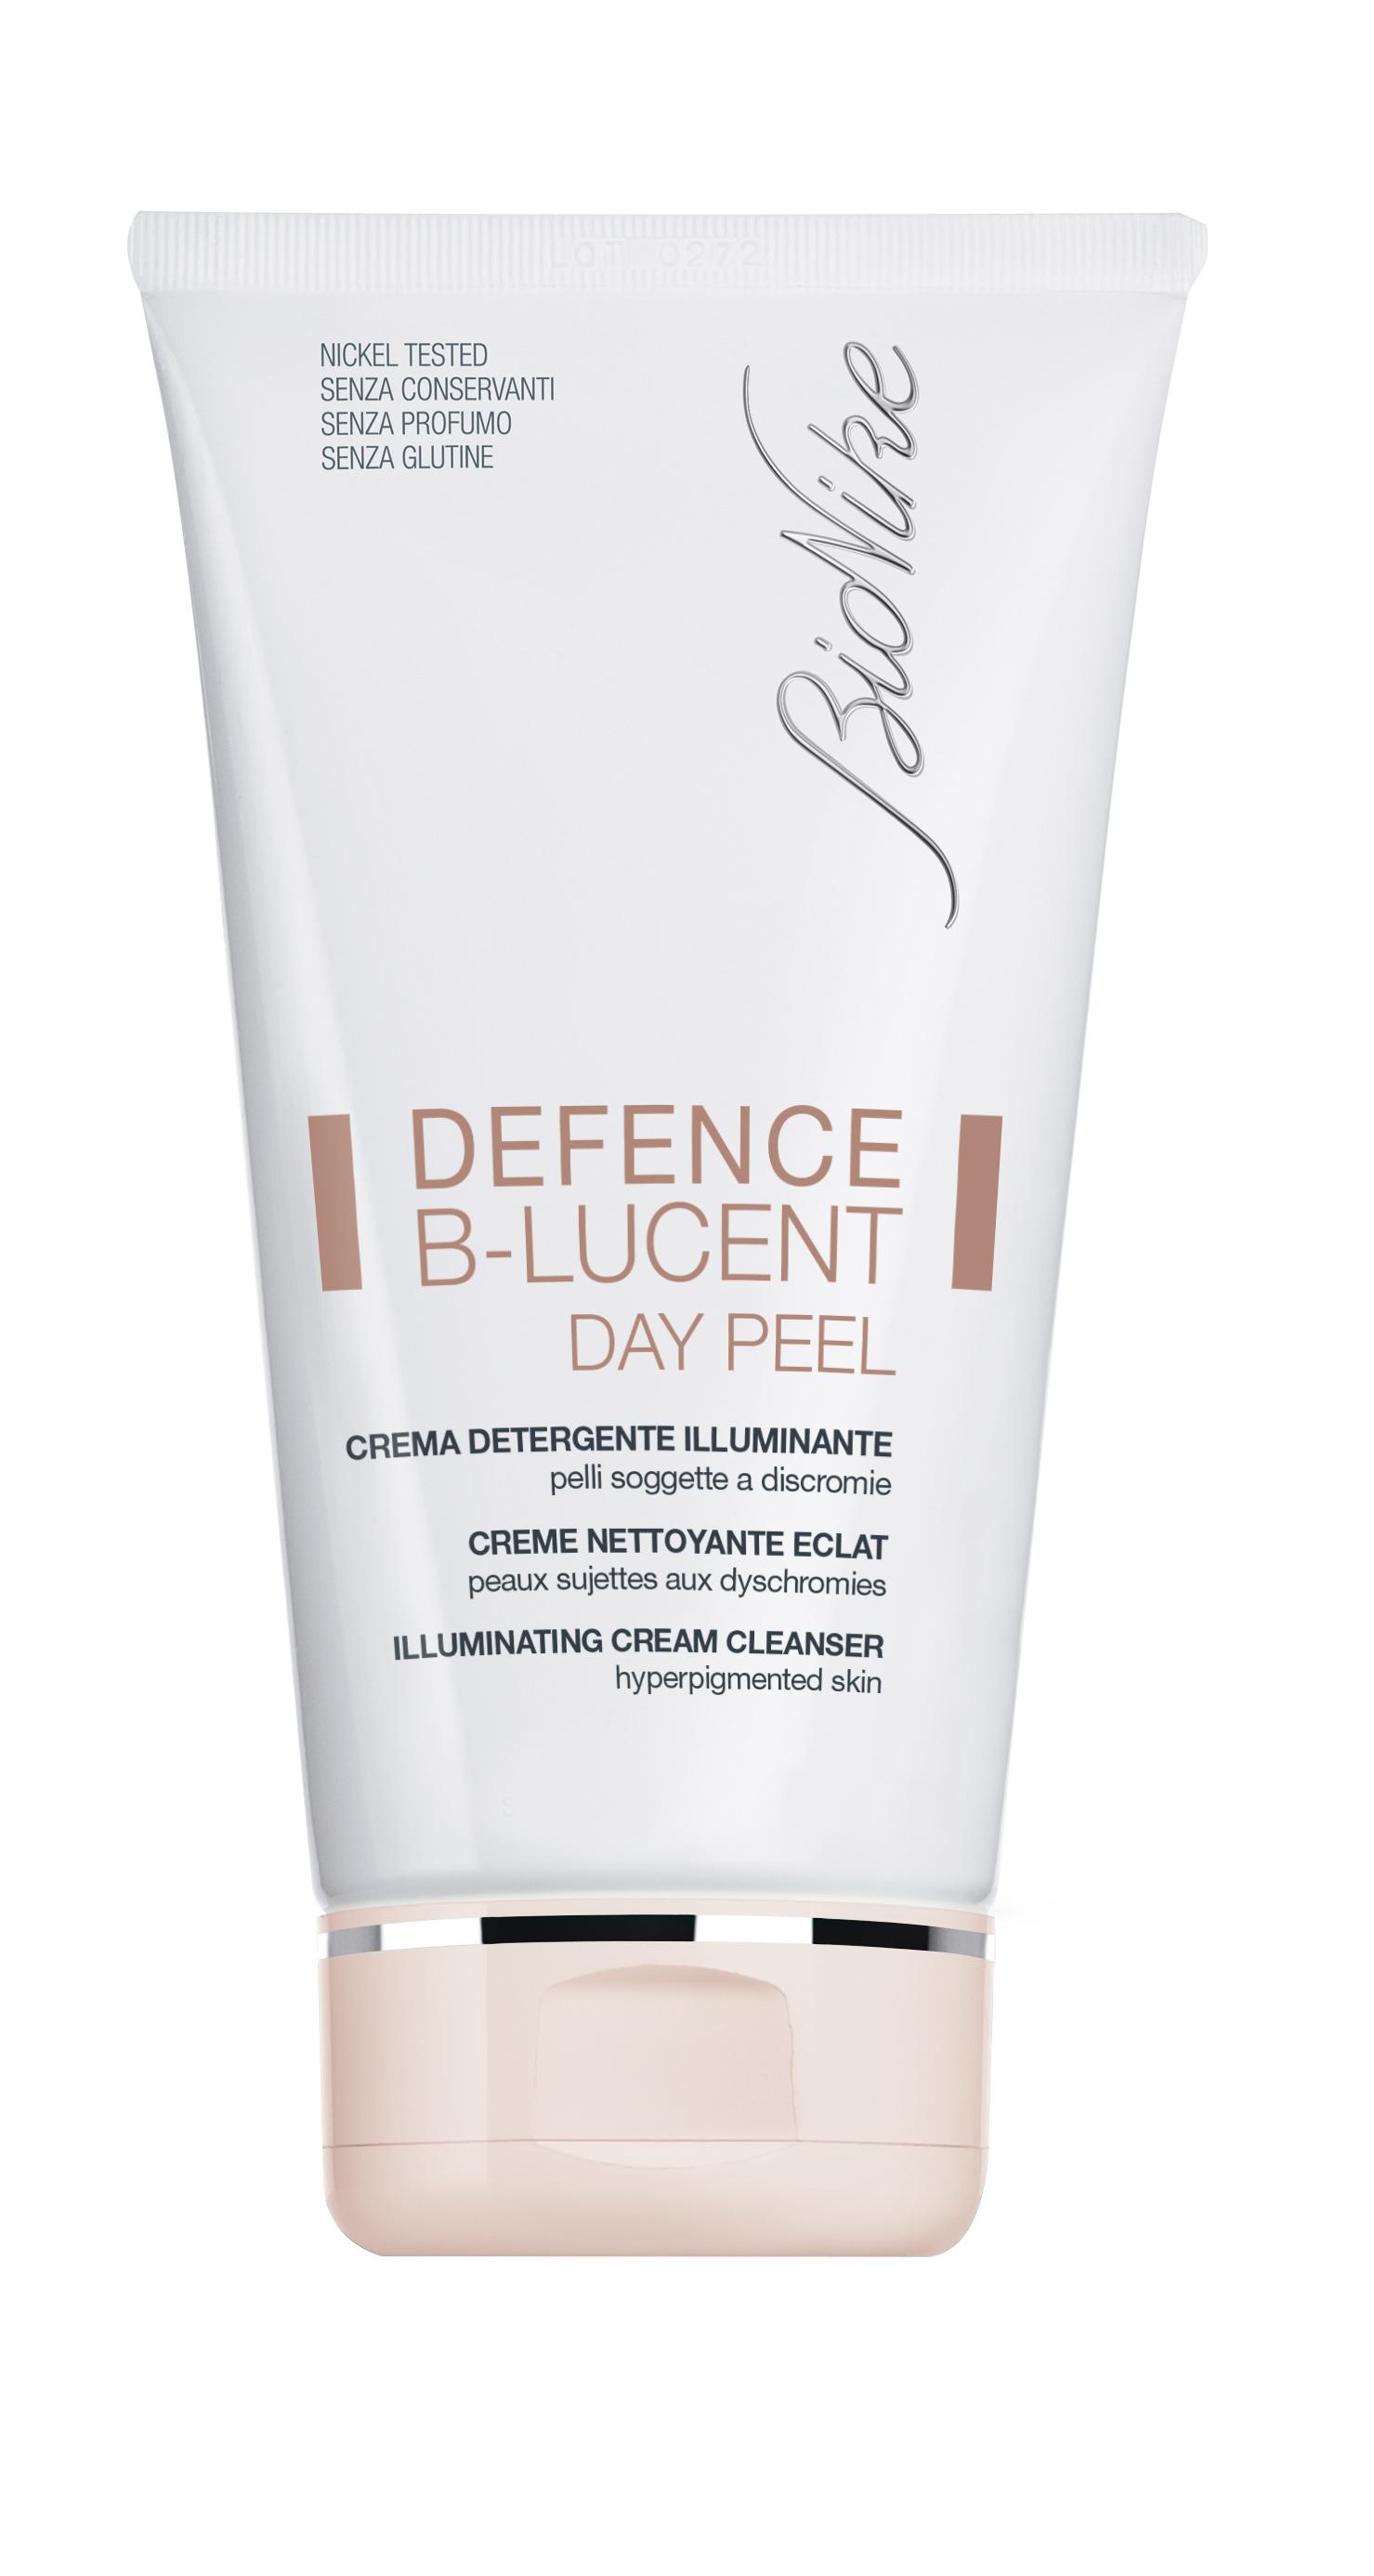 Defence B Lucent Day Peel Crema Detergente Illuminante BioNike 150ml